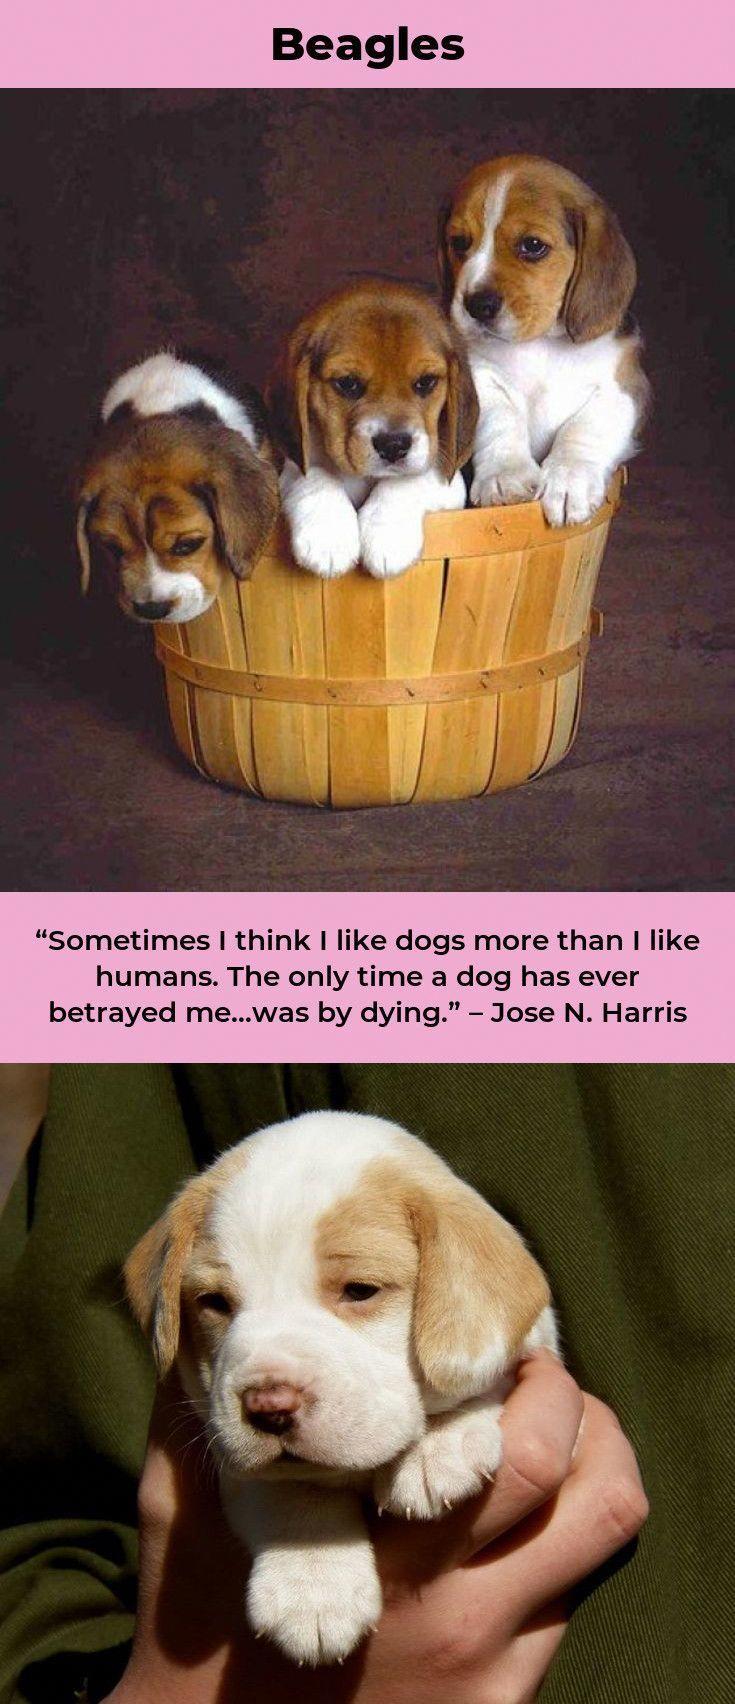 Beagle Pup Beaglesofig Beagleoftheday Animal Beagle Puppy